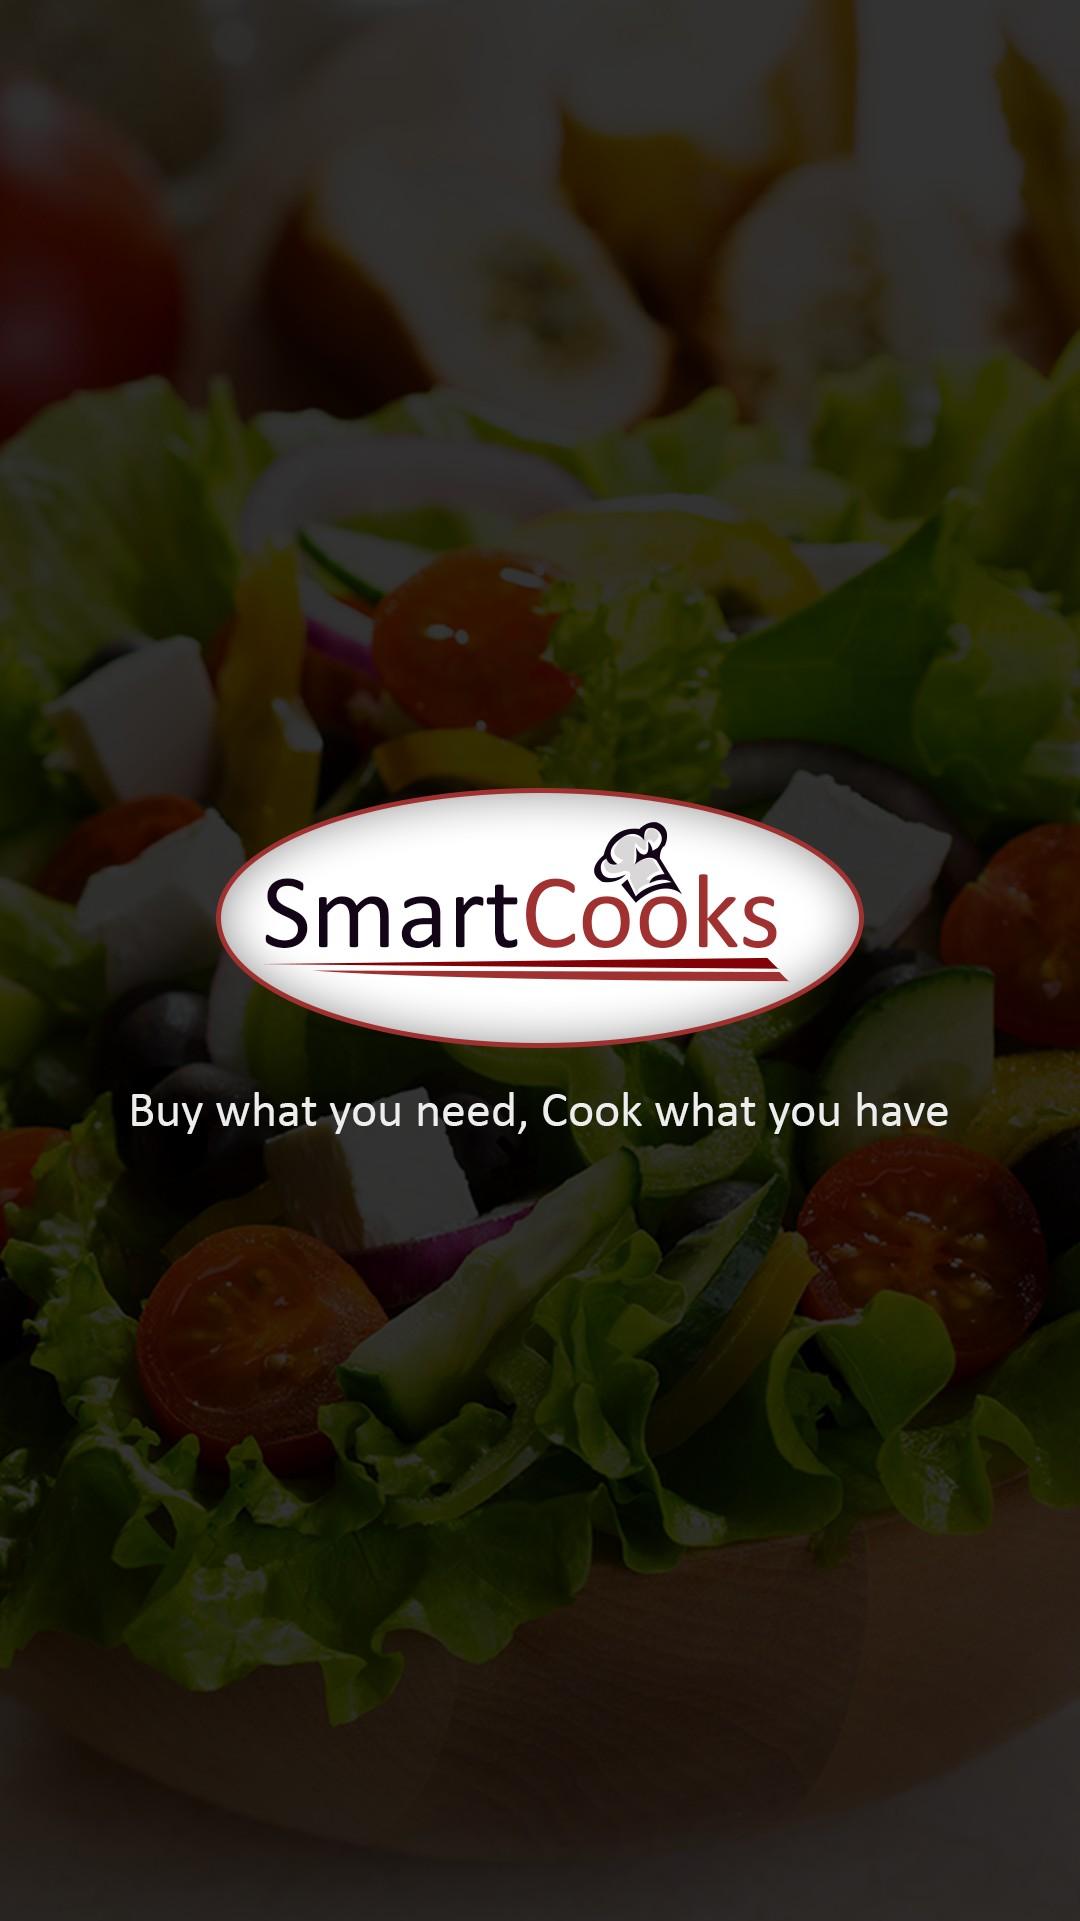 SmartCooks